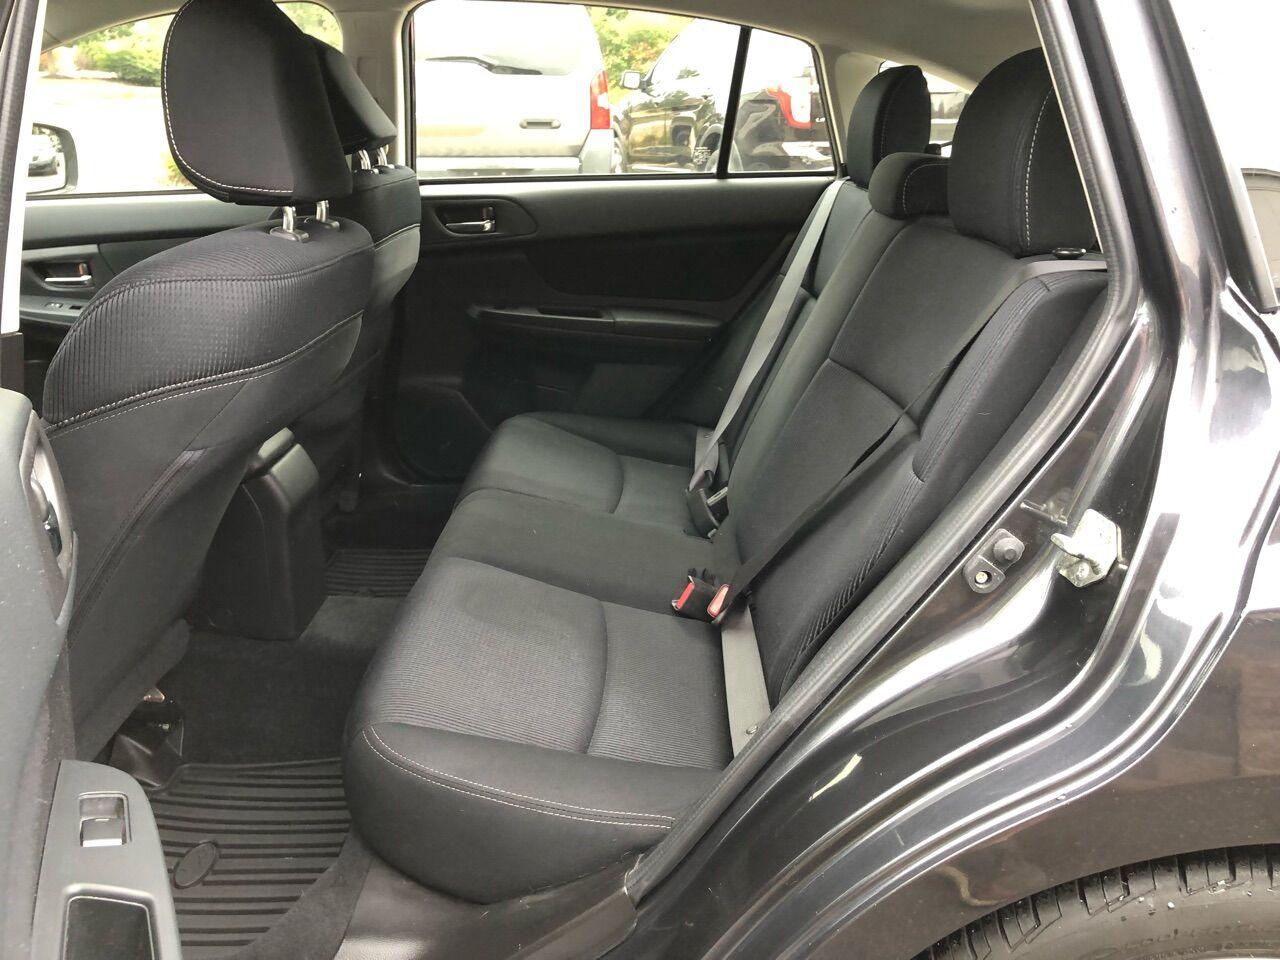 2013 Subaru Impreza Station Wagon